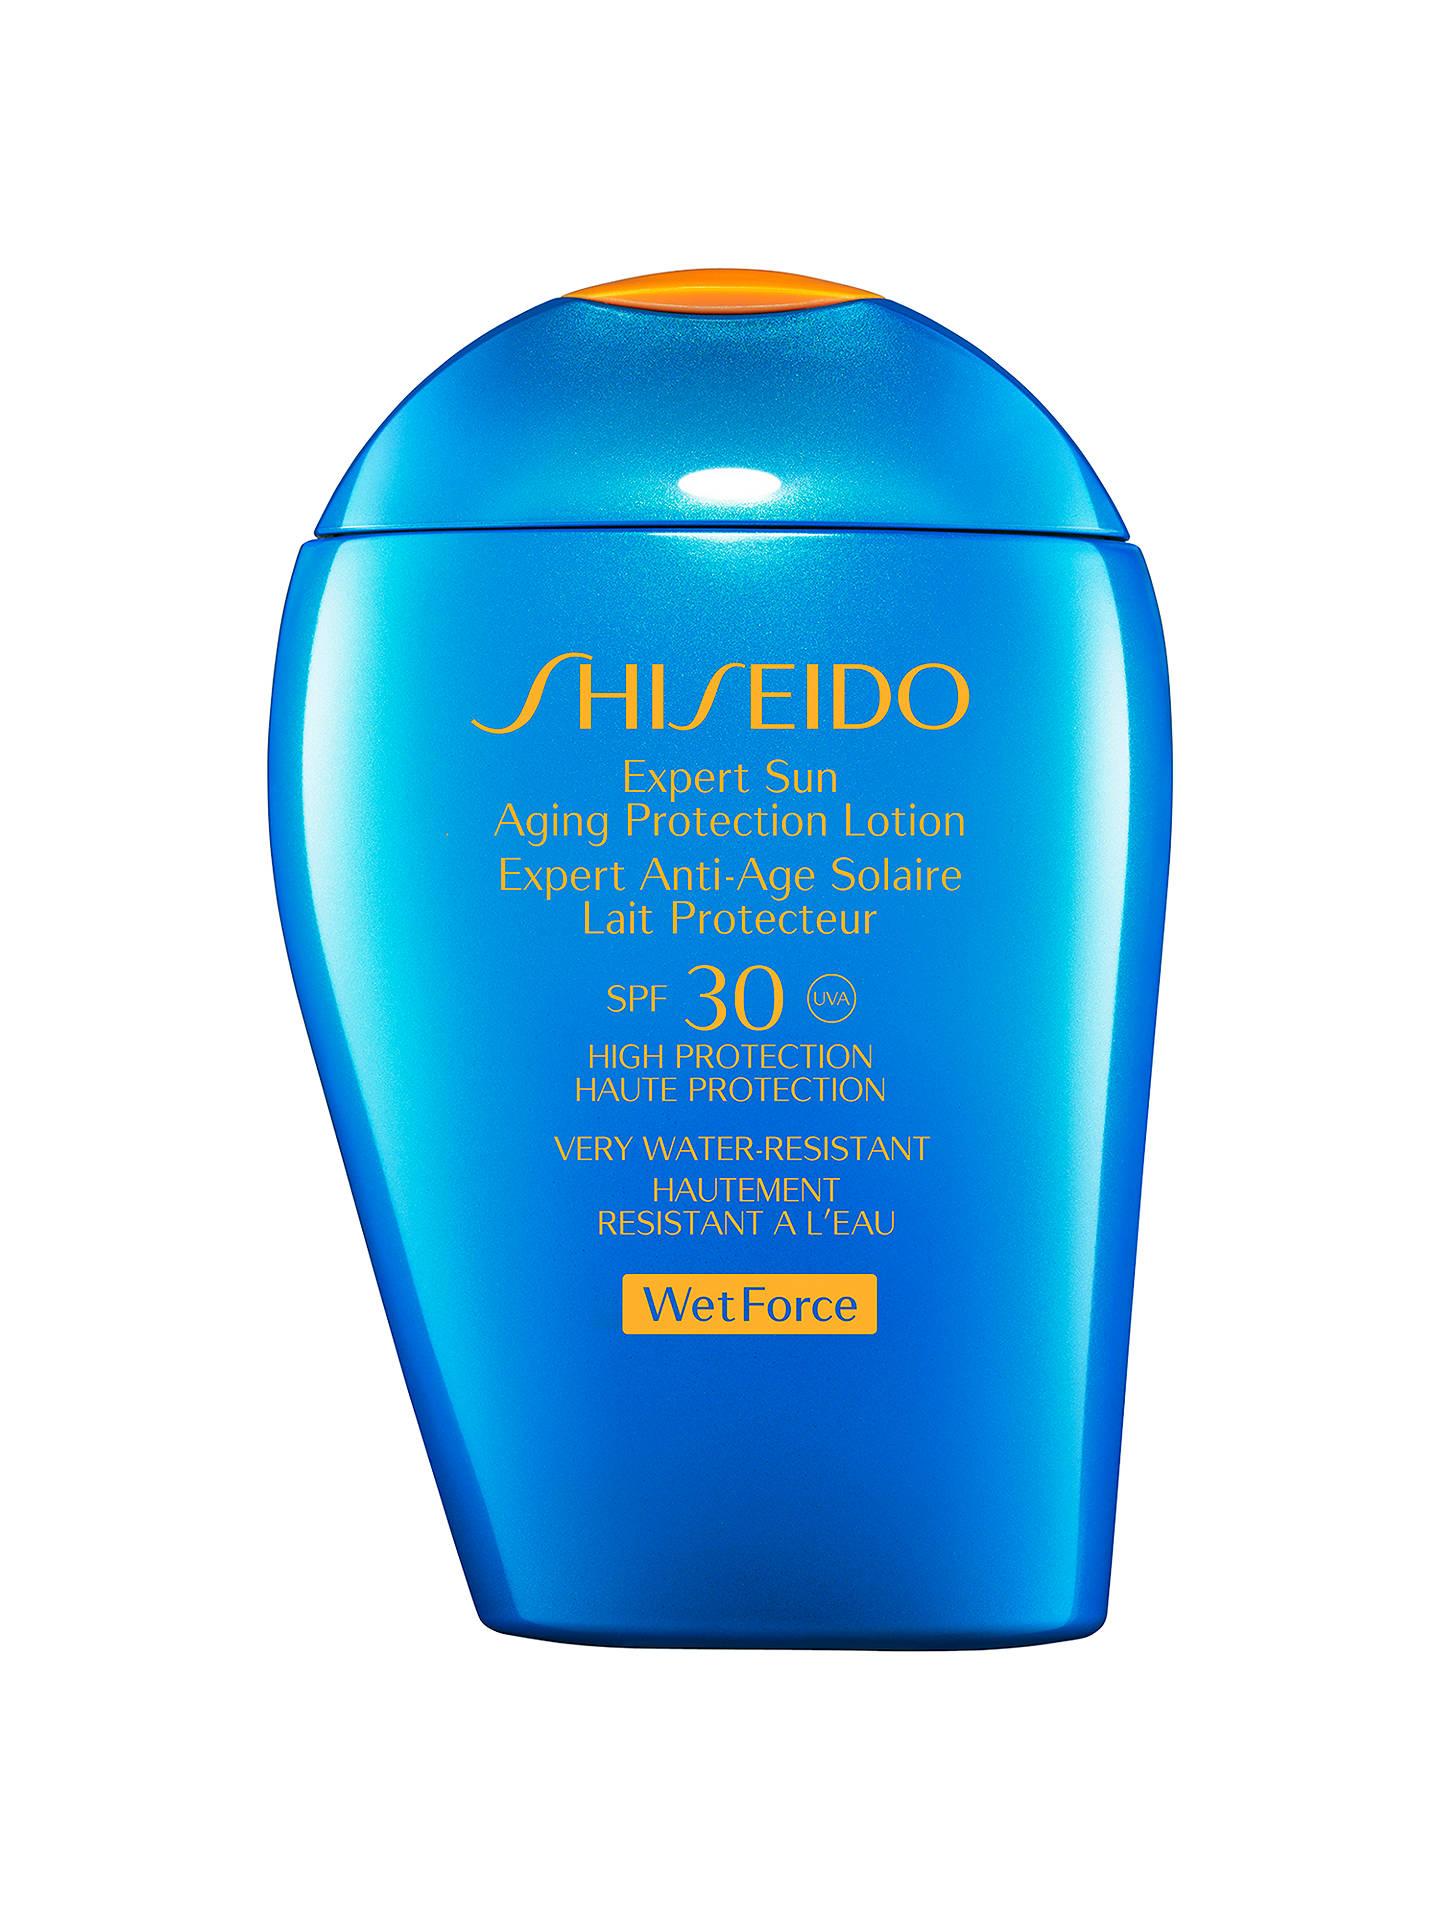 Shiseido Wetforce Expert Sun Aging Protection Lotion Spf 30 100ml Body Sp Buyshiseido Online At